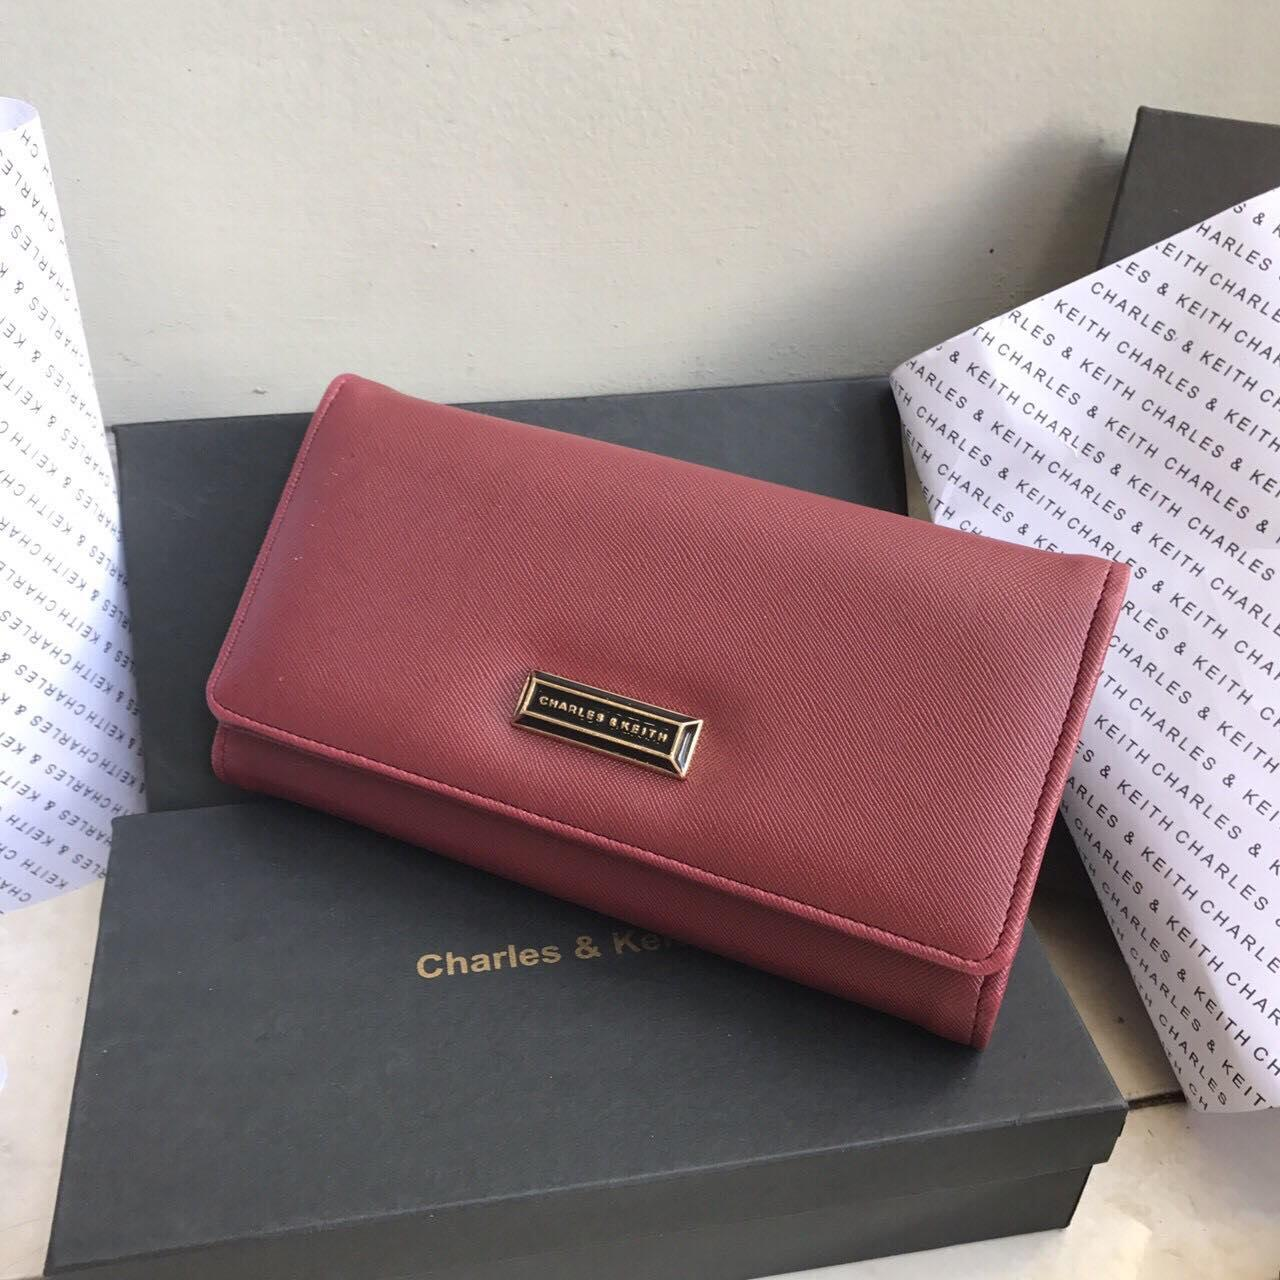 Dompet wanita import Tas wanita cewek branded handbag korea grosir cewek  murah import fashion branded murah d4051e47db